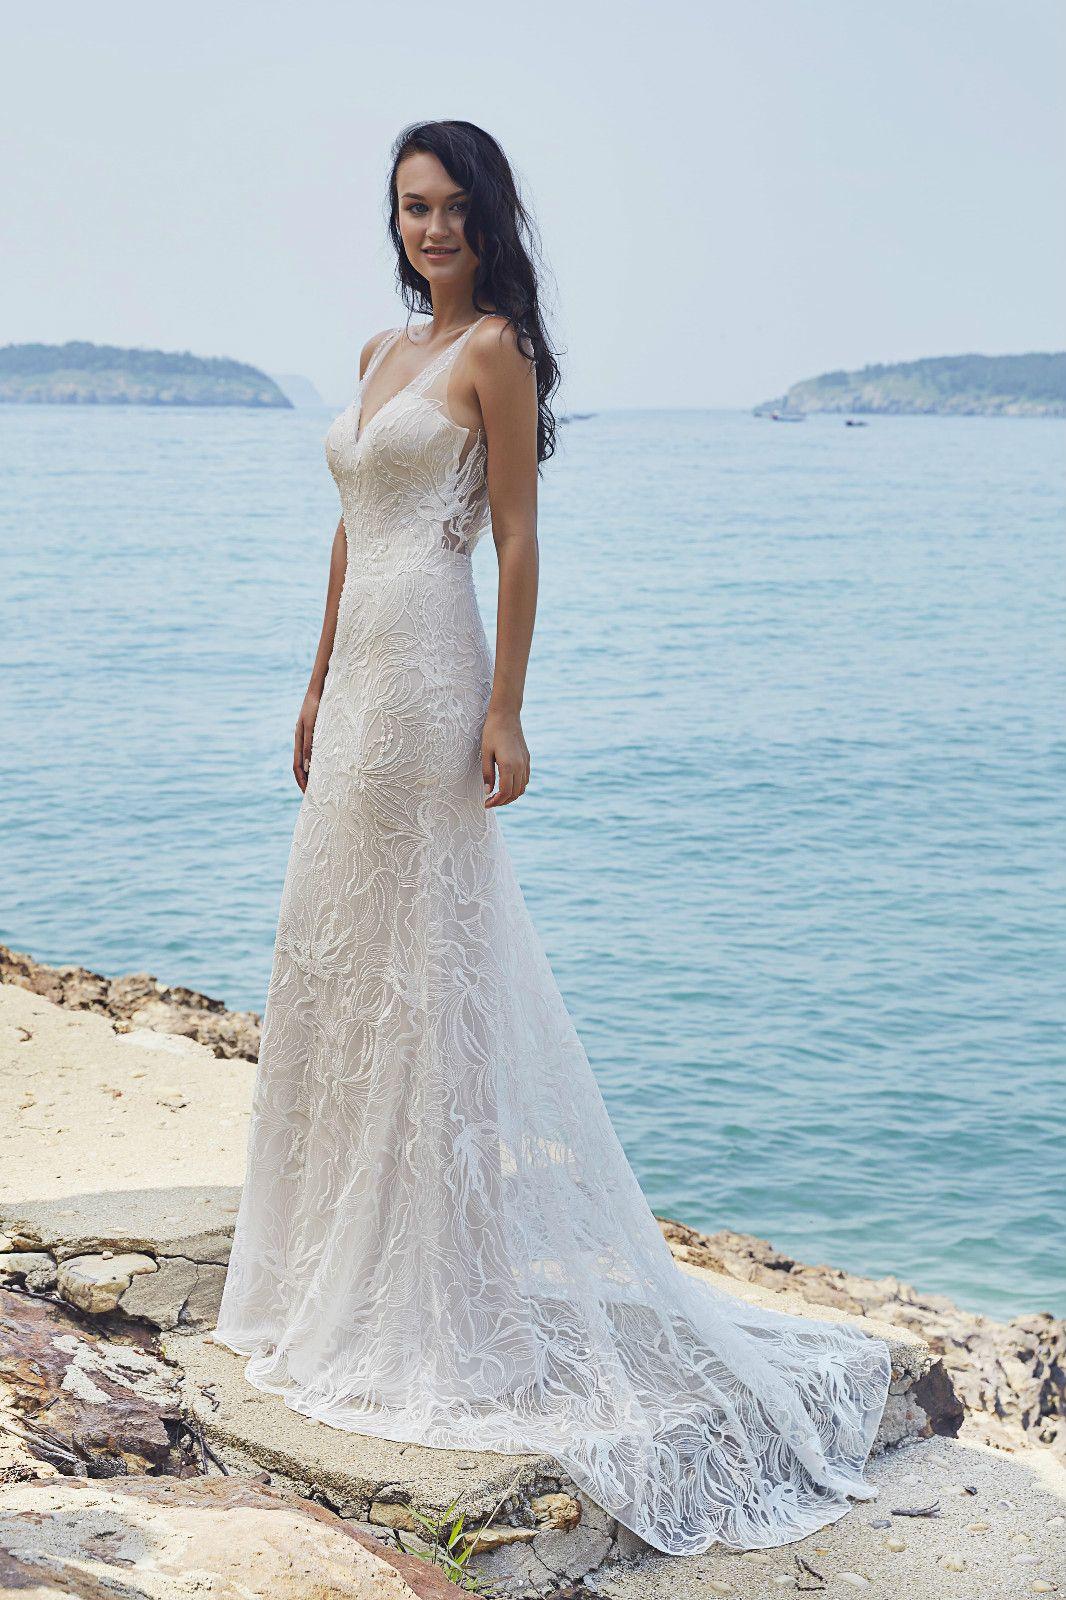 Virena - BRIDAL - Chic Nostalgia – Bohemian and Romantic Wedding ...